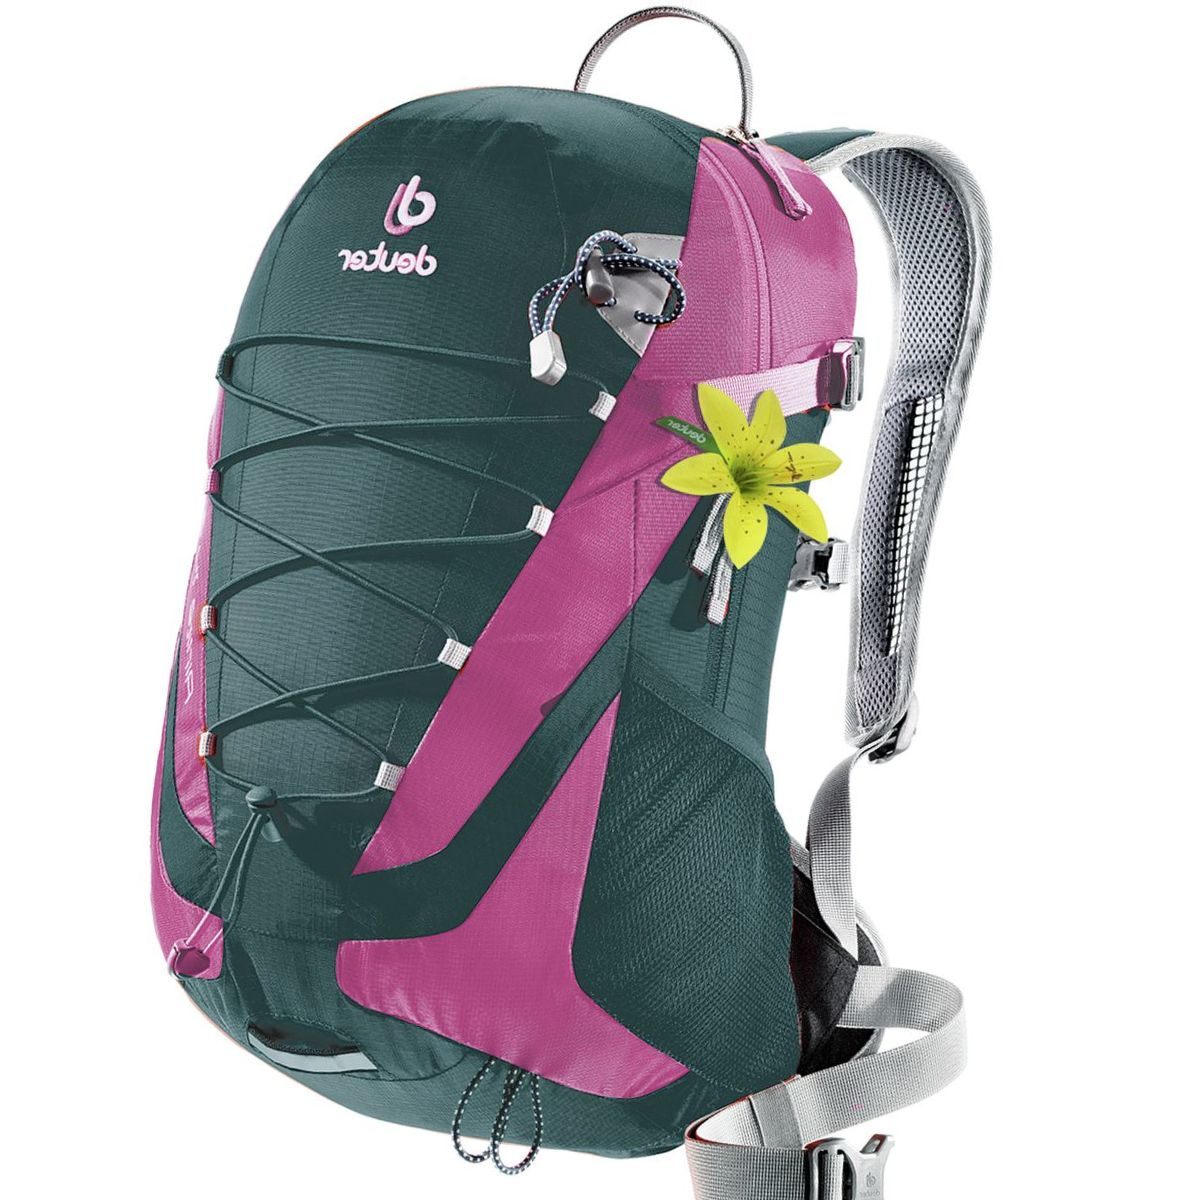 Deuter Airlite SL 14L Backpack - Women's